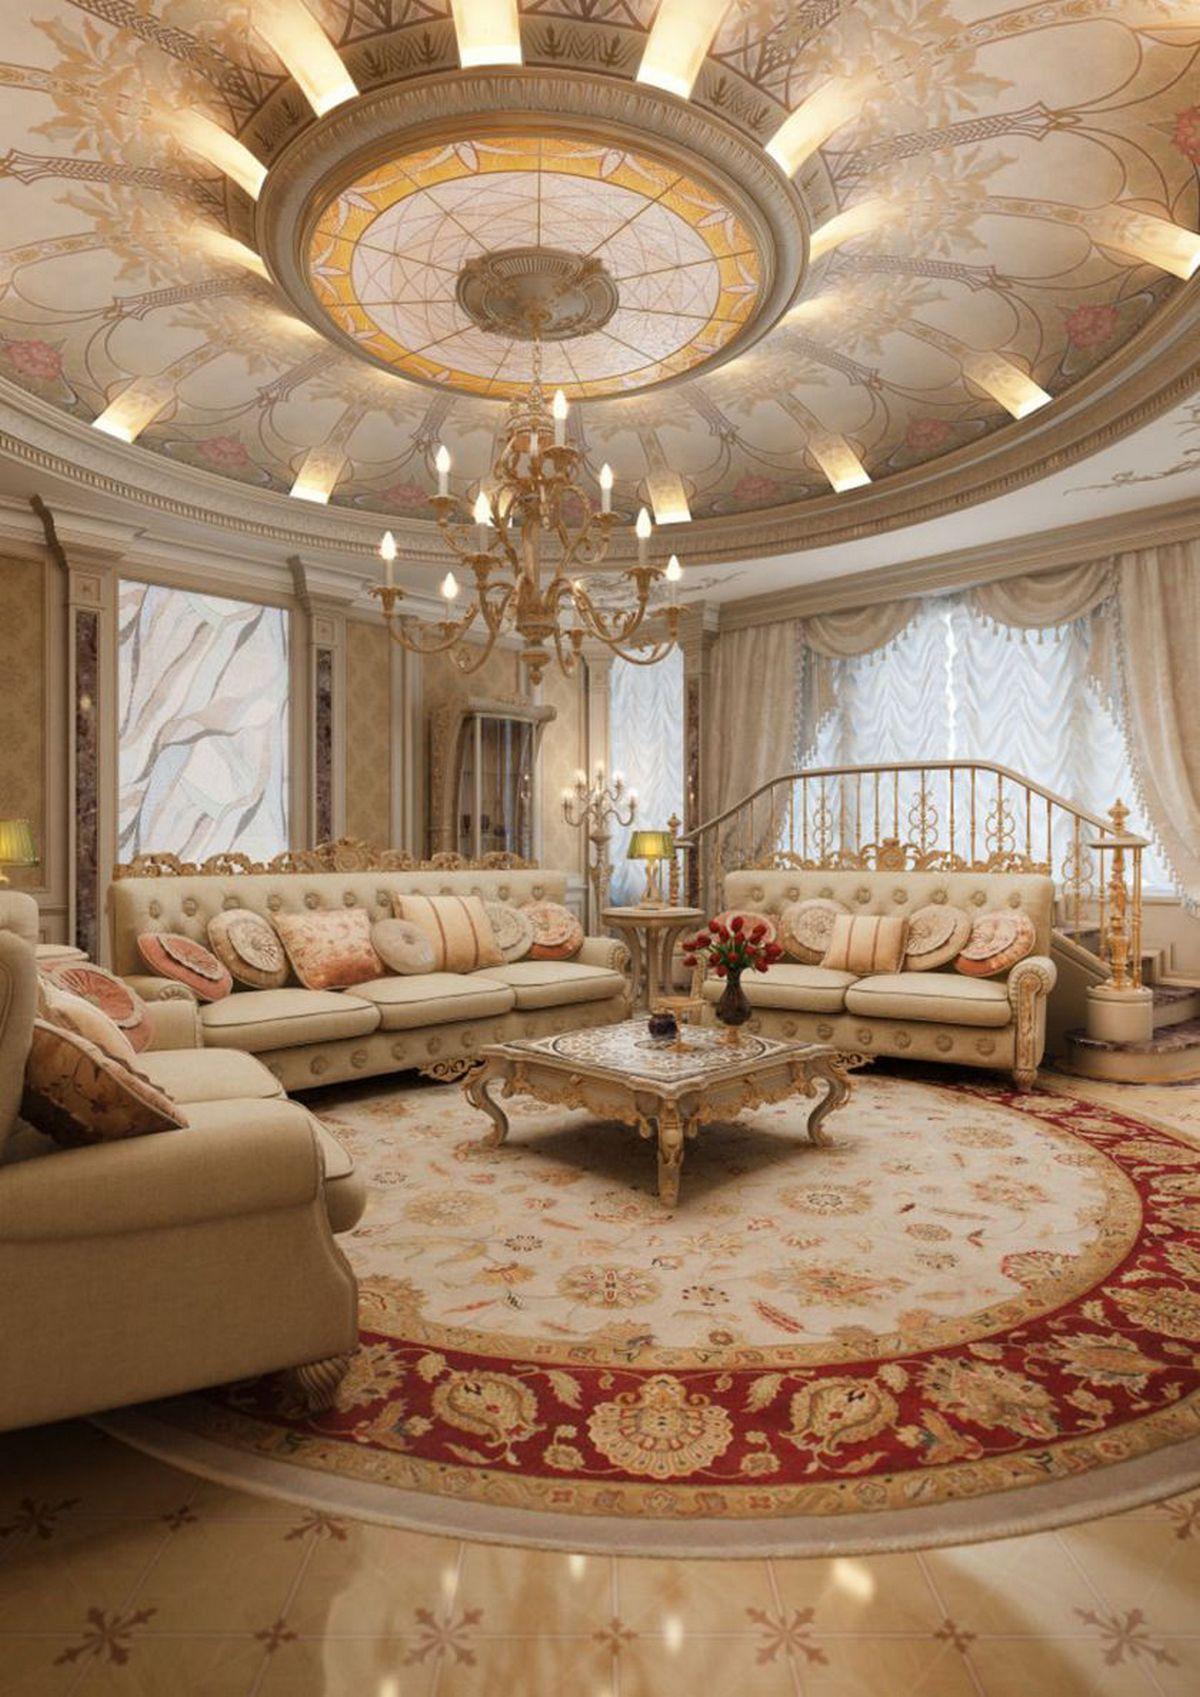 гостиная в стиле барокко на фото